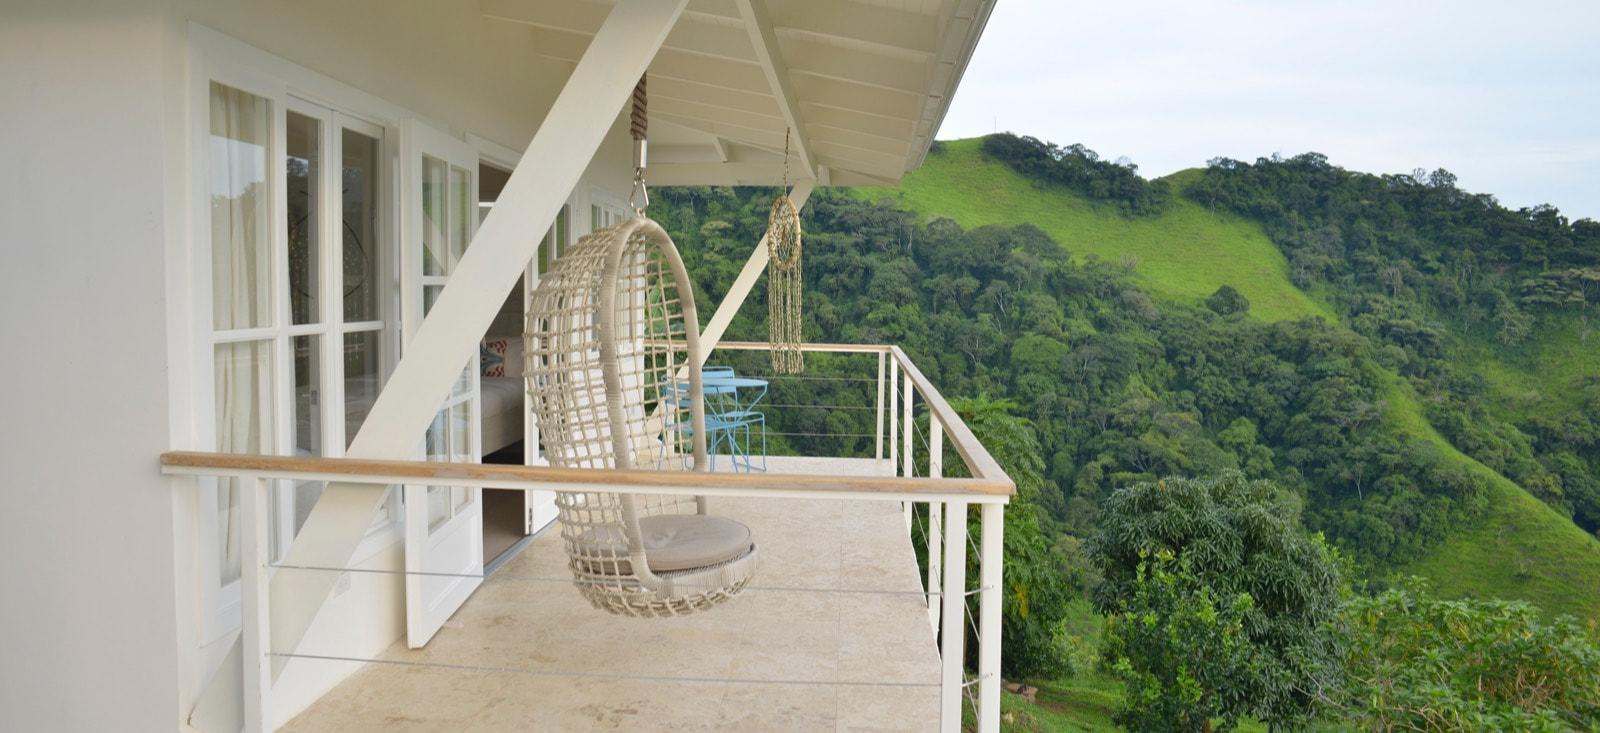 casita-balcony_8_orig.jpg